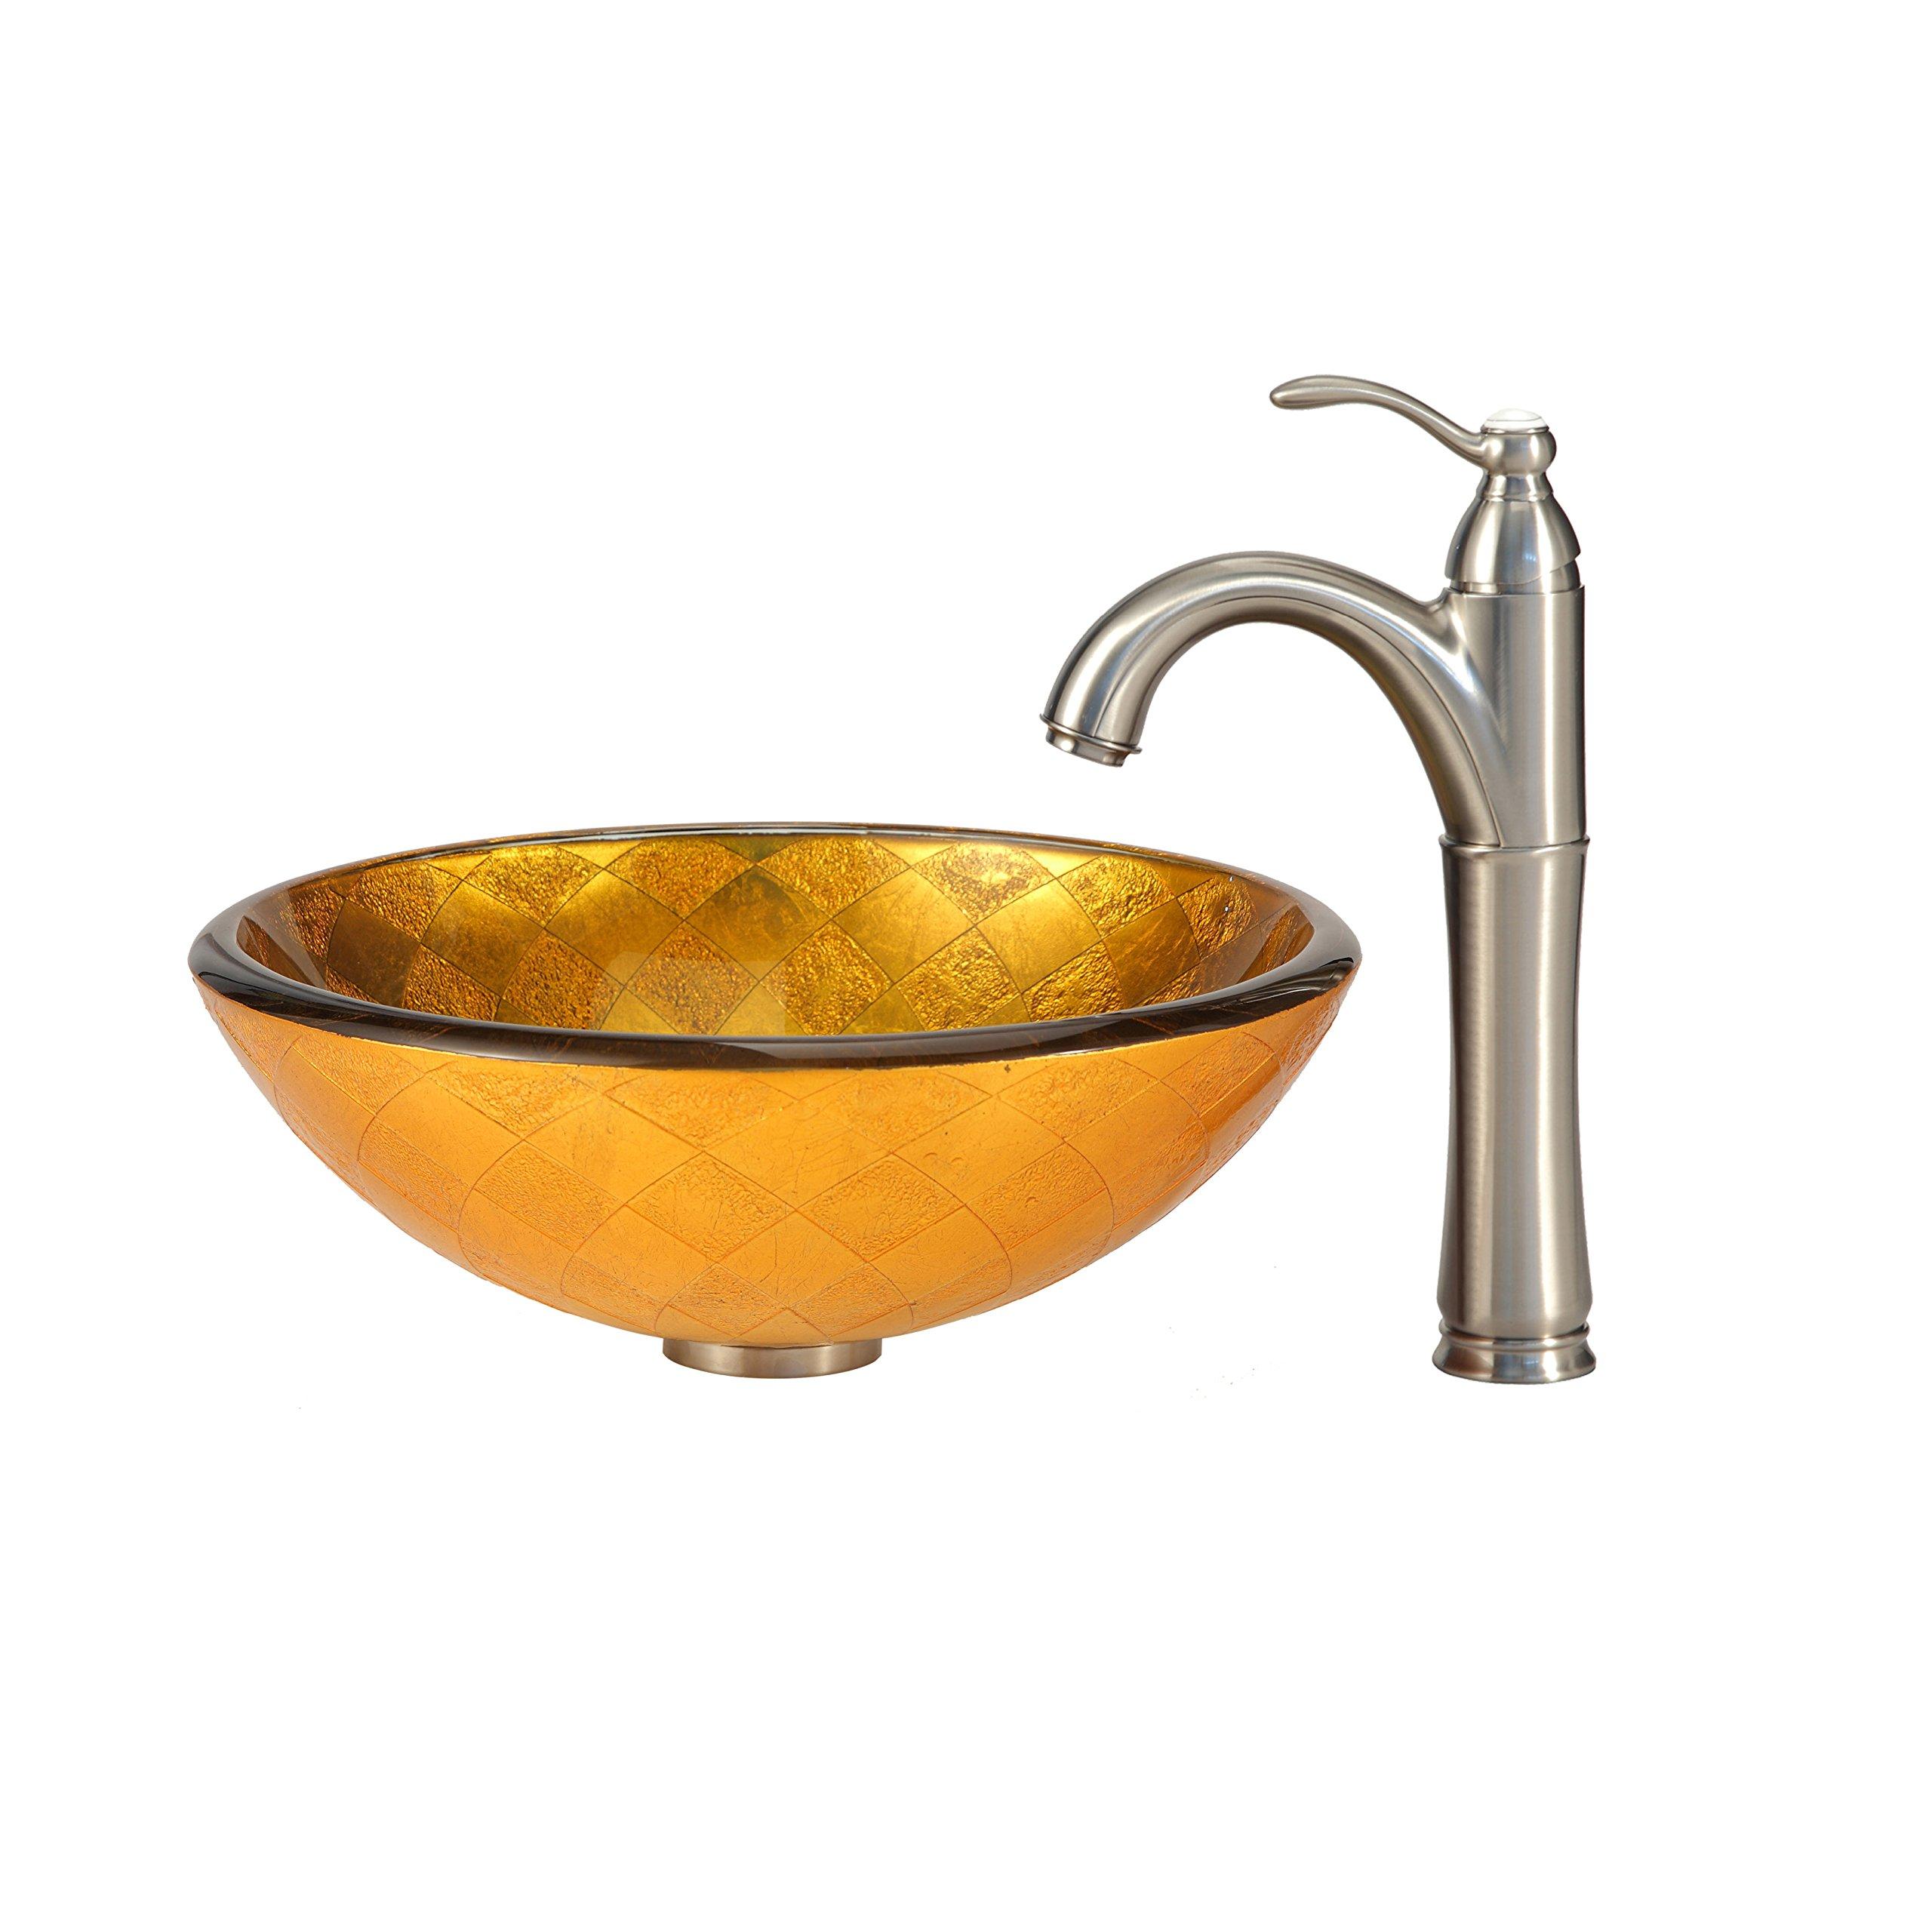 Kraus GV-691-19mm Orion Glass Vessel Bathroom Sink